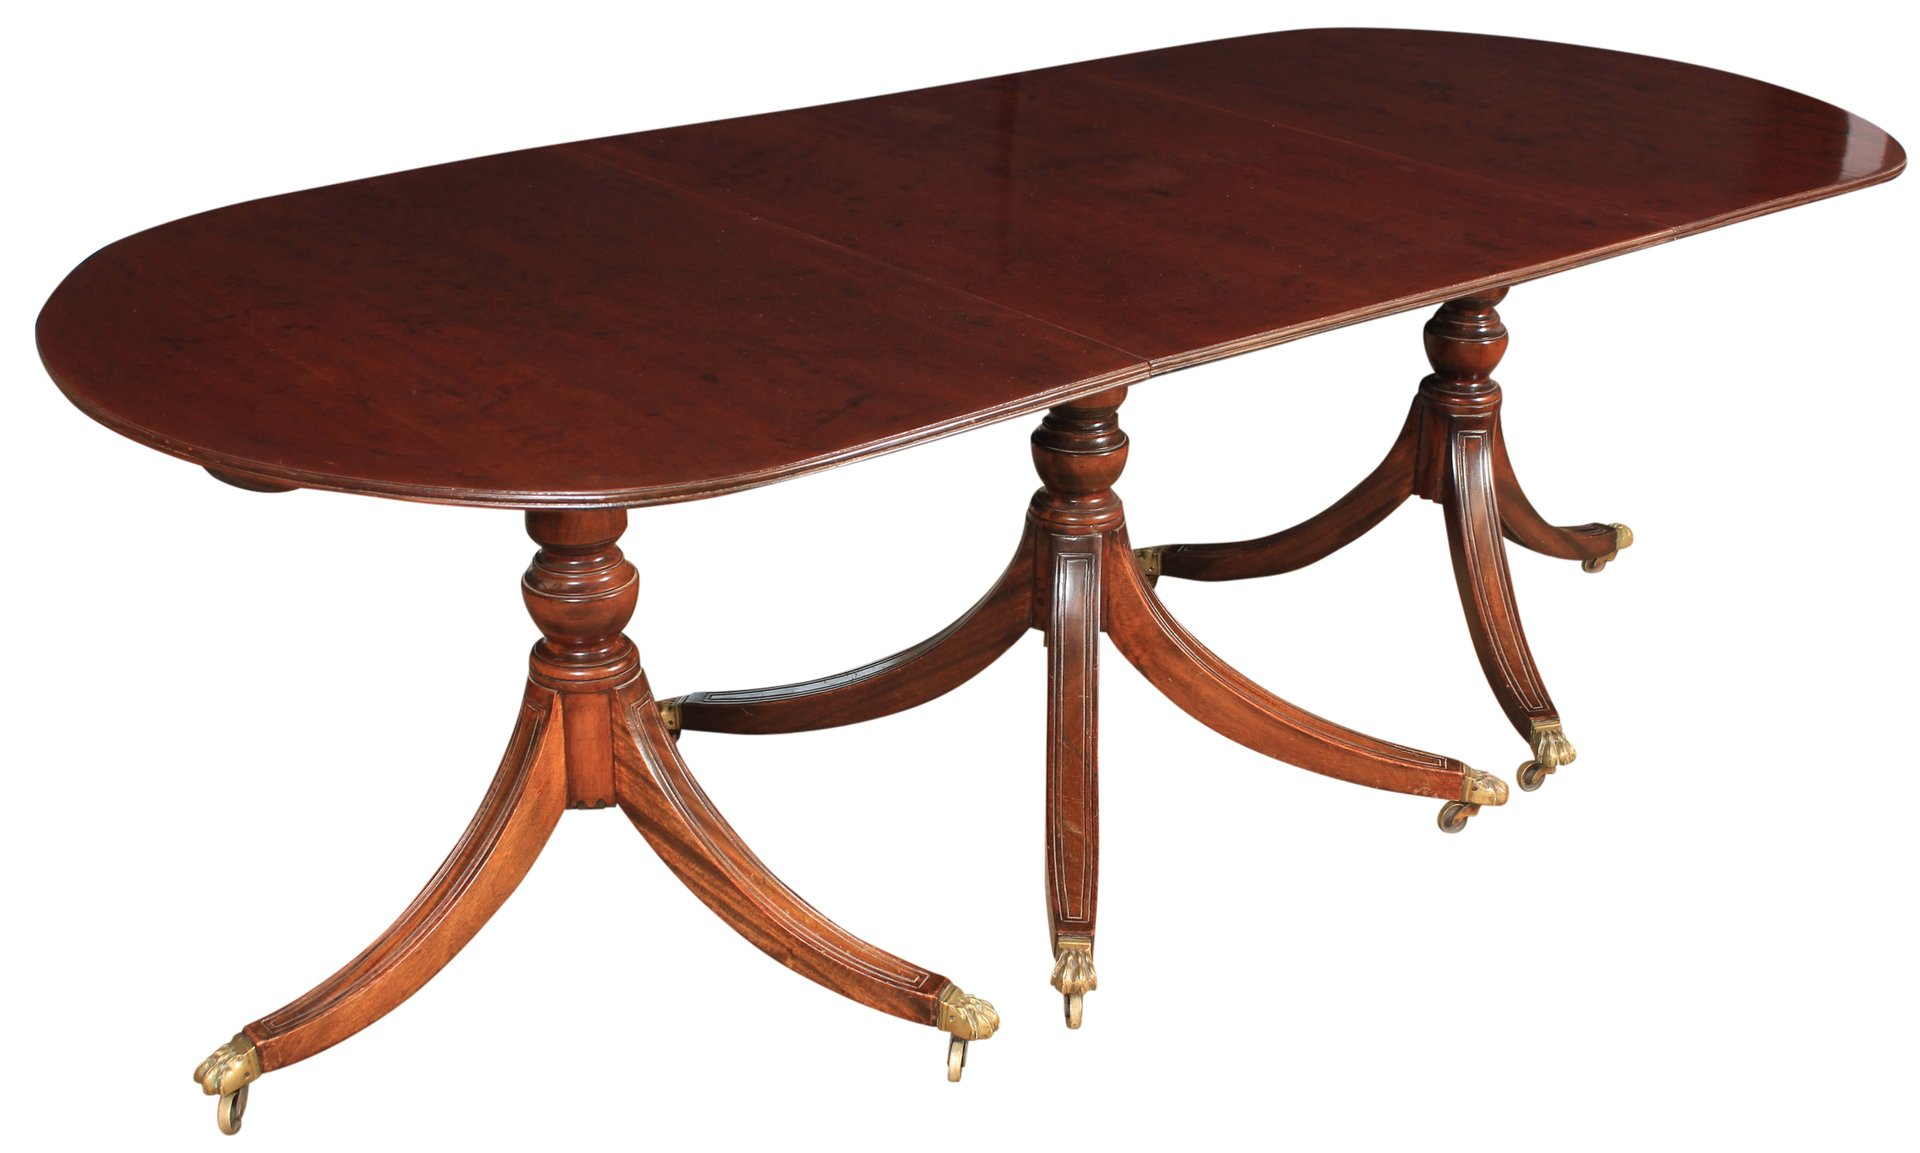 Large Triple Pillar Mahogany Dining Table, 1920s